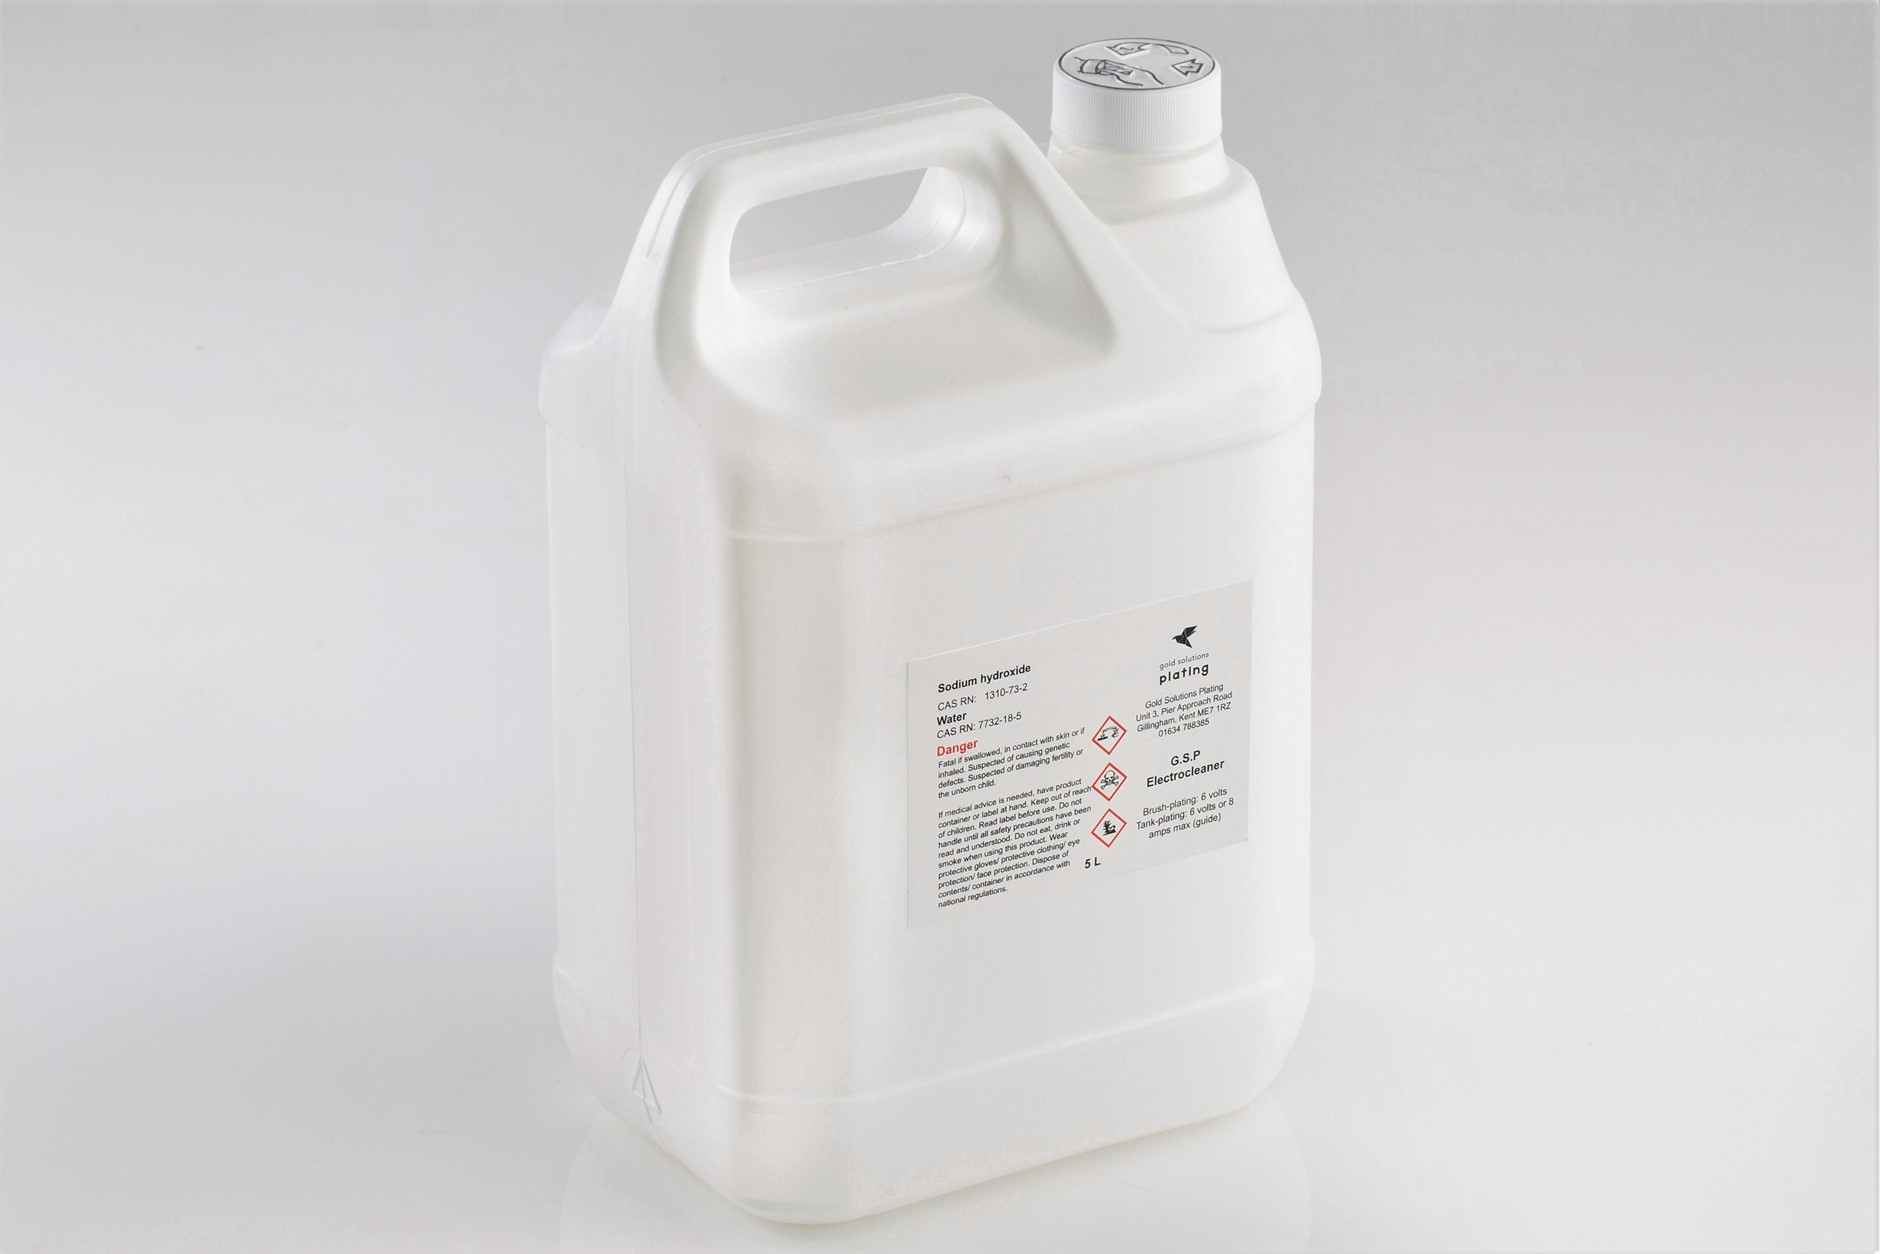 G.S.P Electrocleaner Solution, 5 litre bottle